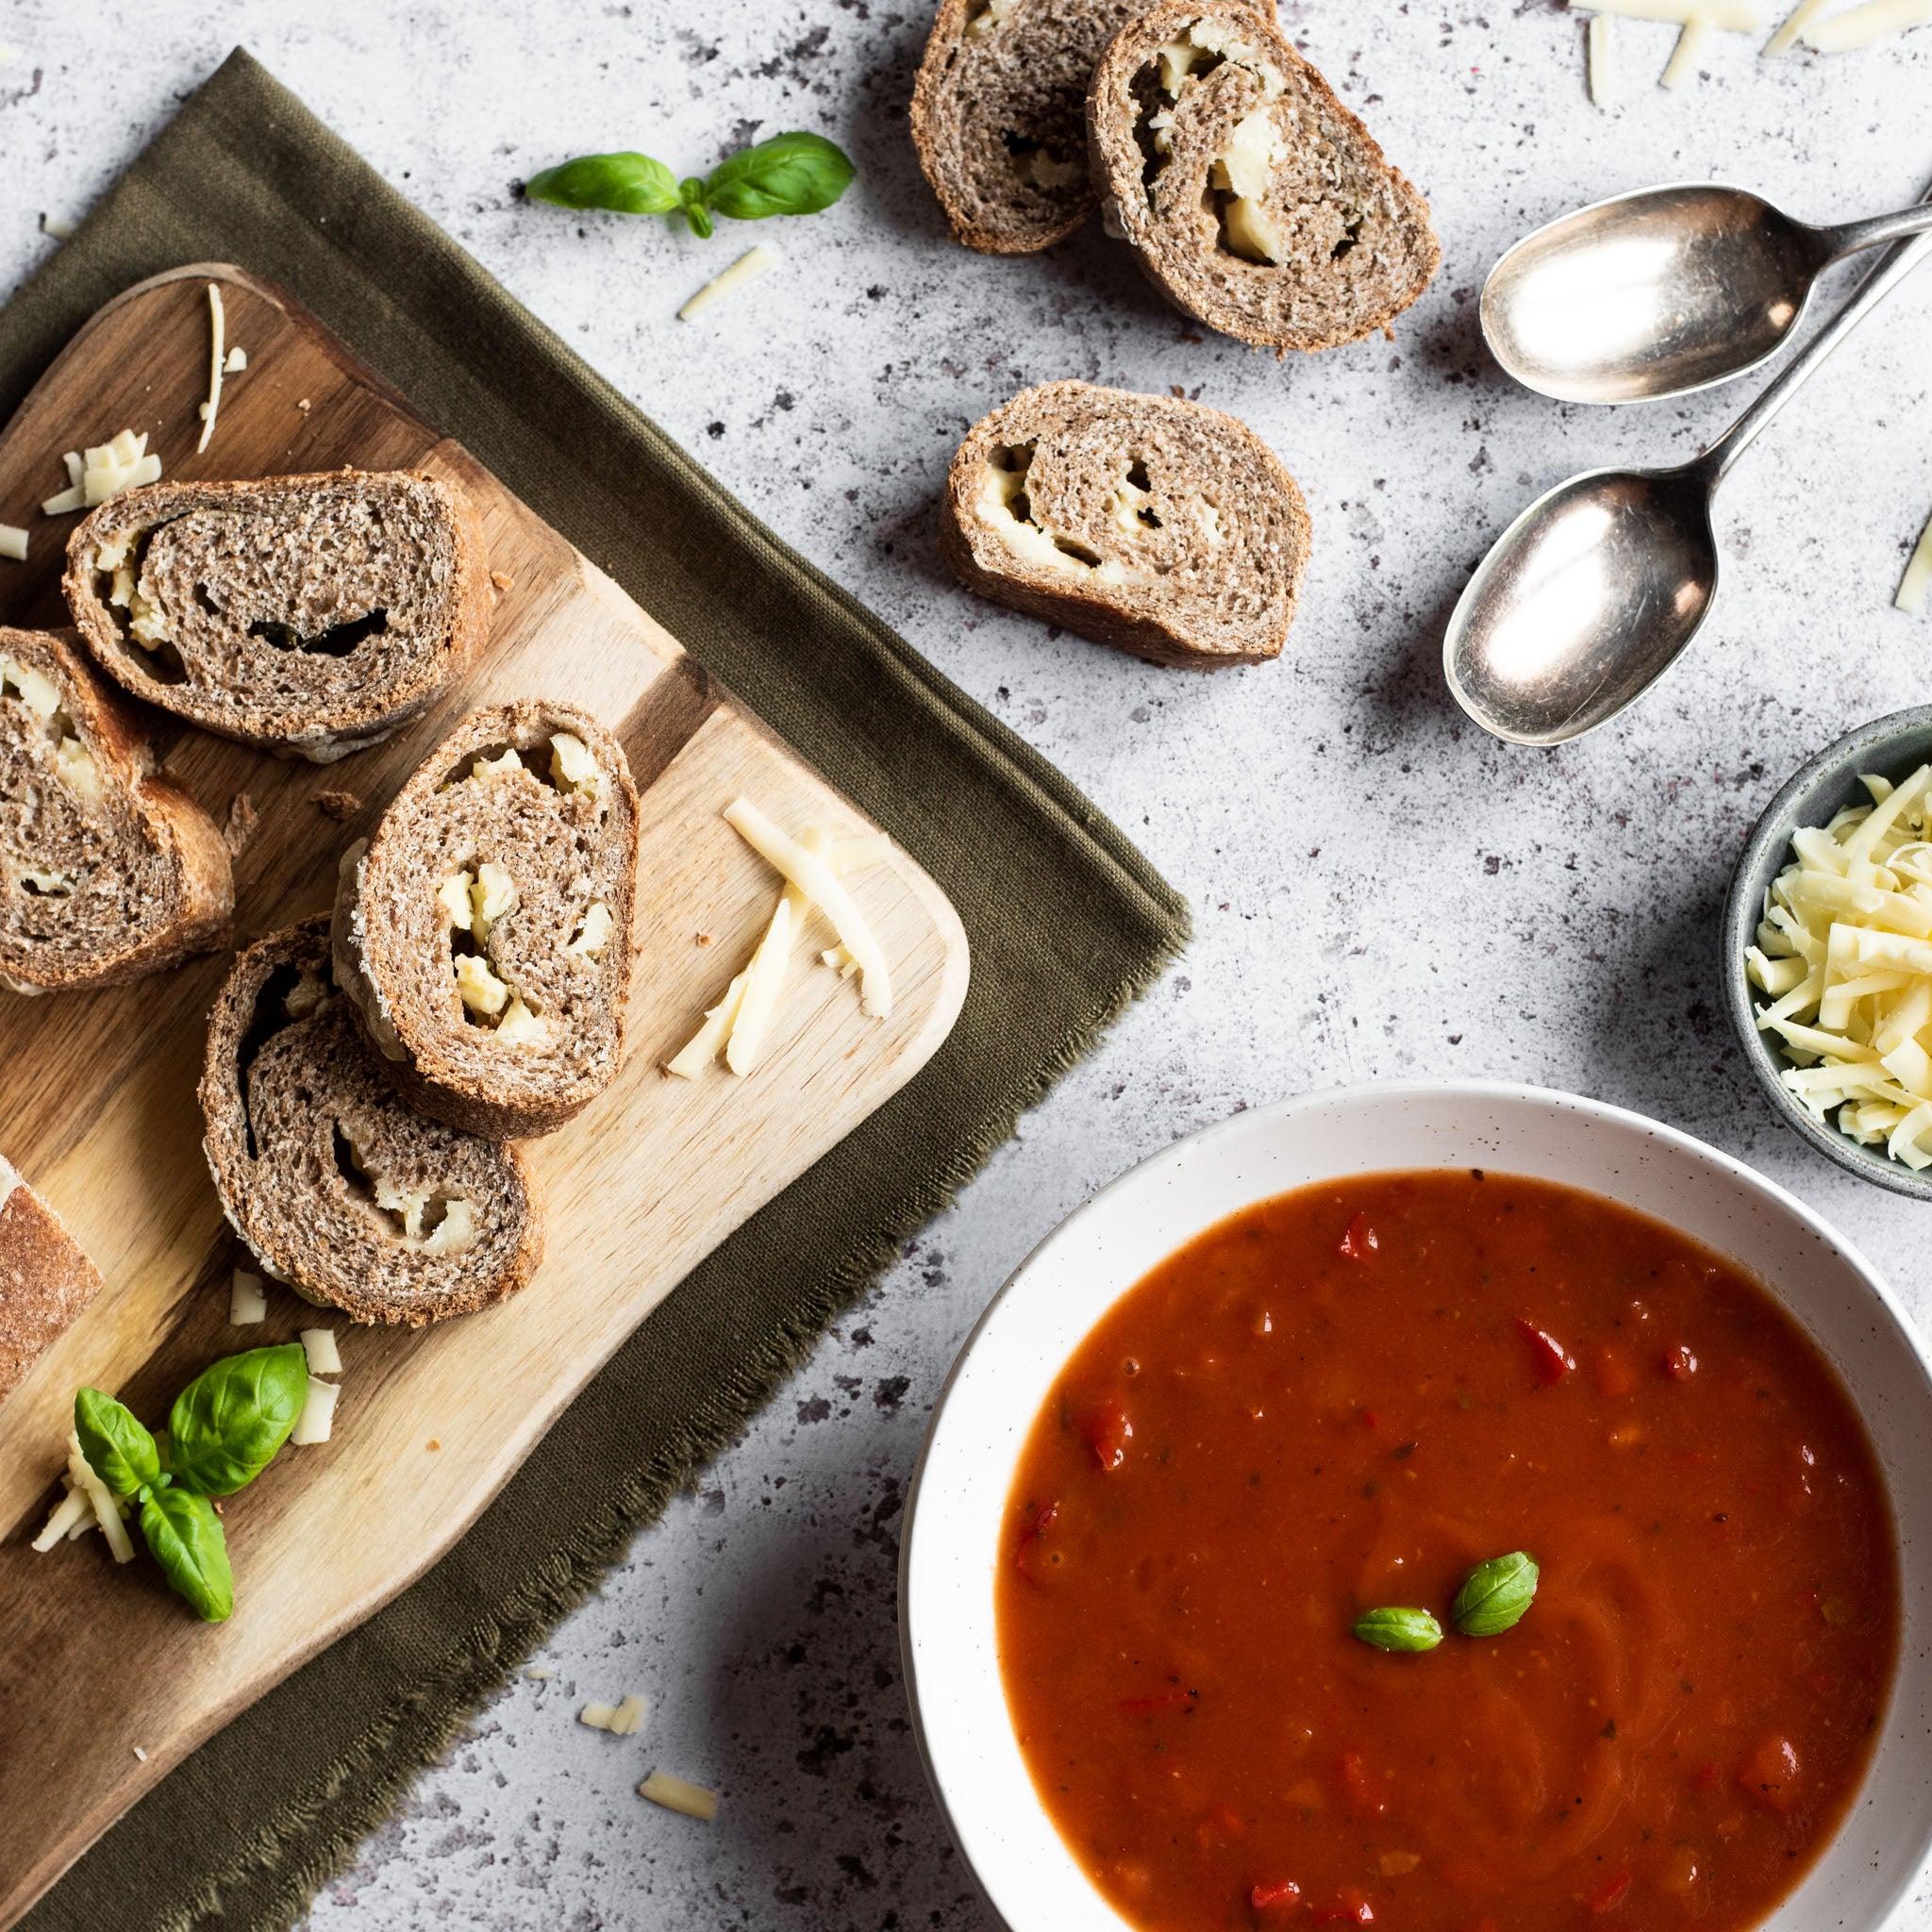 Cheese-and-Basil-Pinwheel-Bread-SQUARE-3.jpg